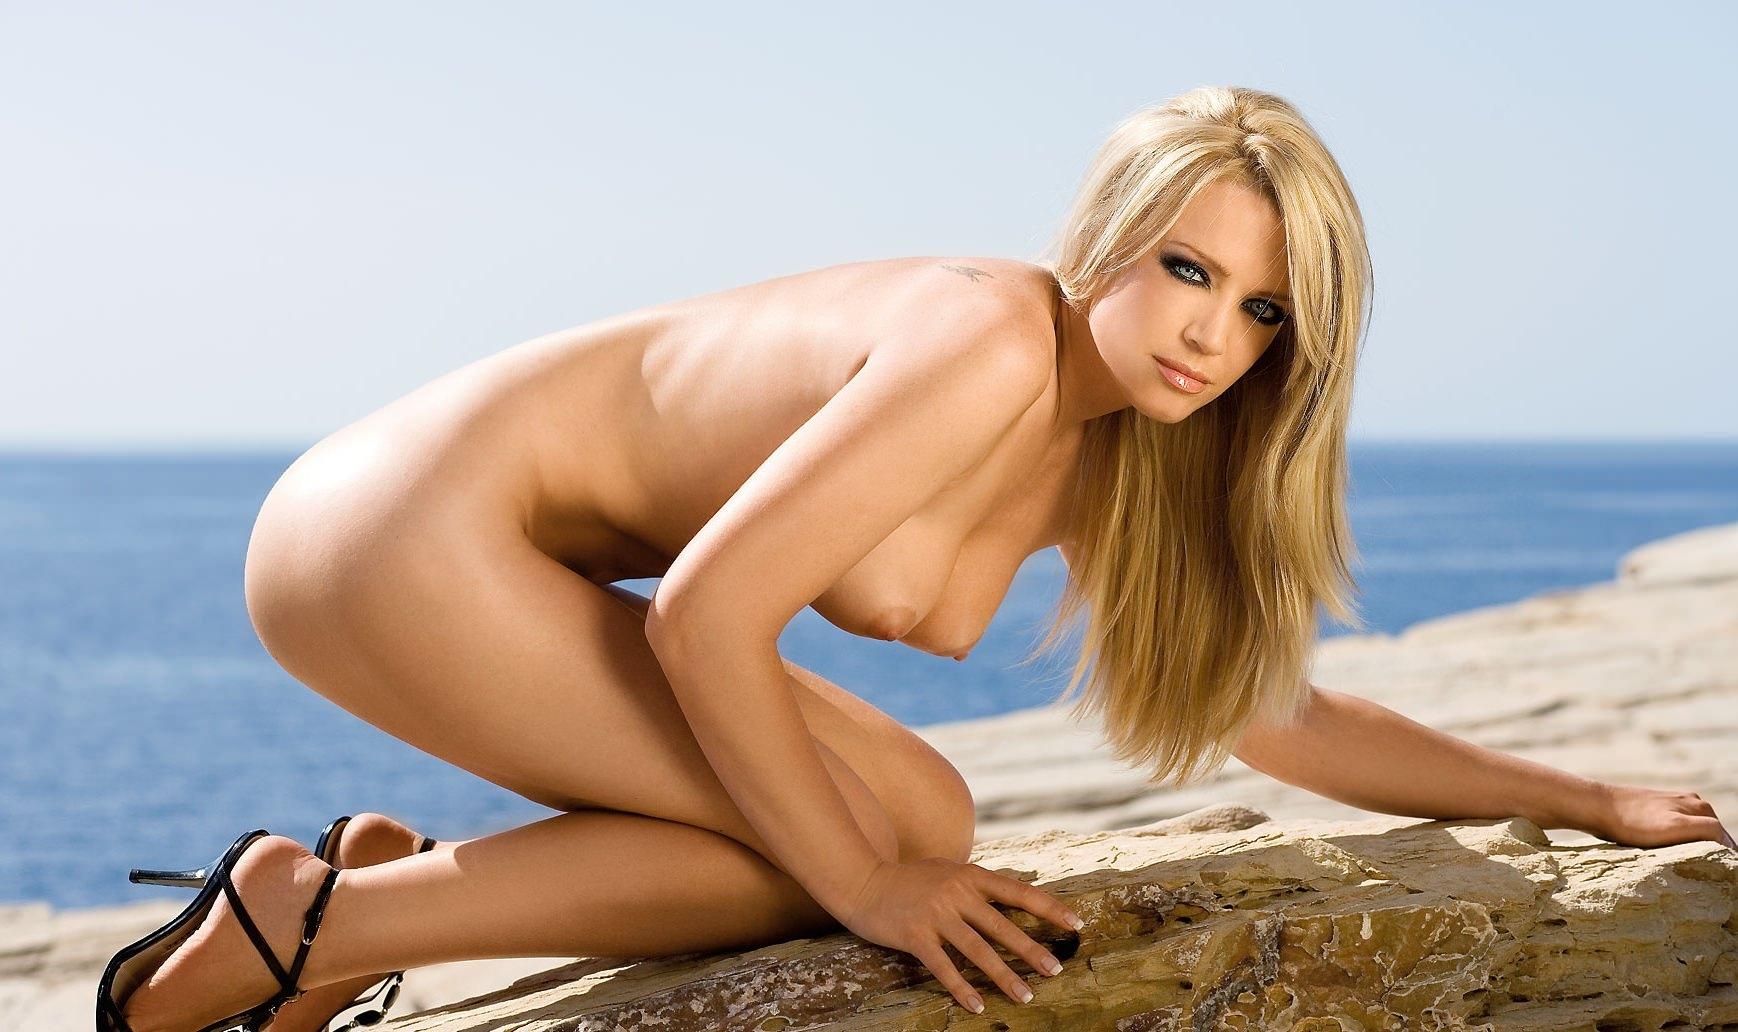 Hilary duff nude fakes porn